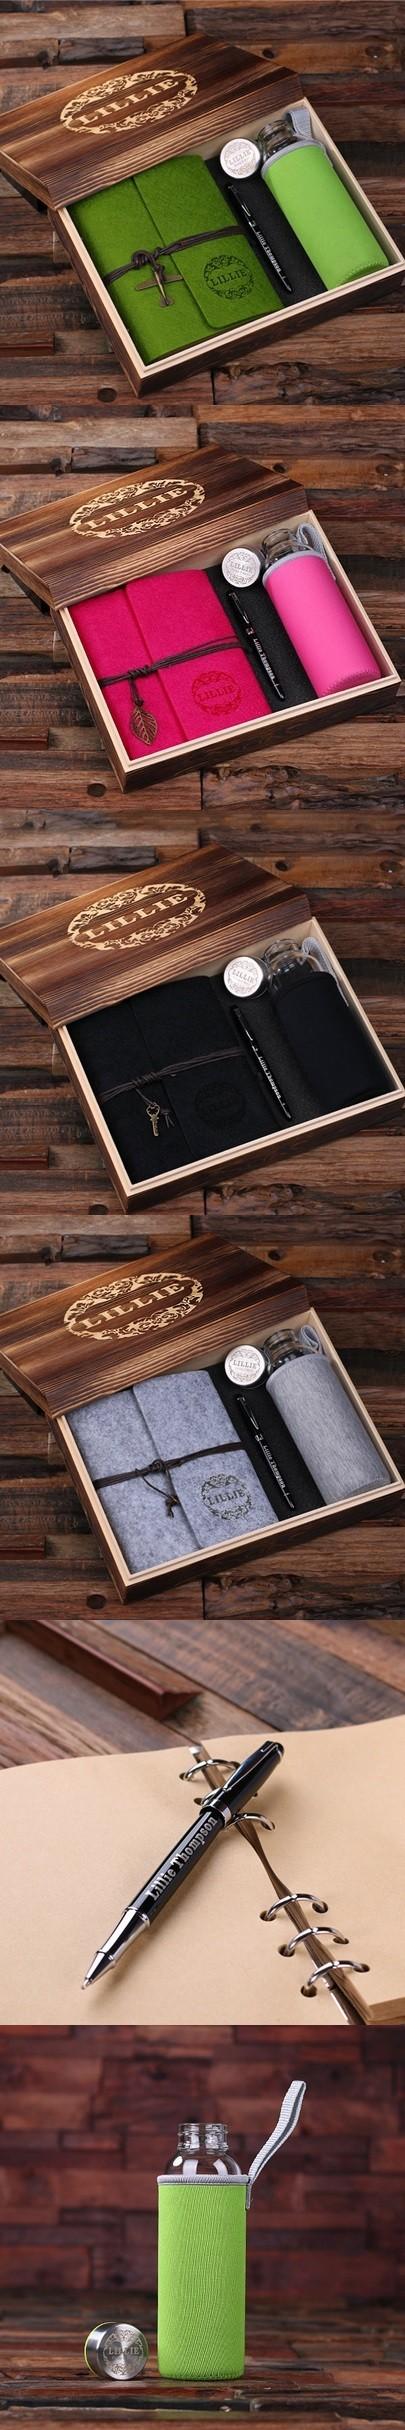 Personalized Gift-Set with Journal, Pen & Water Bottle in Keepsake Box